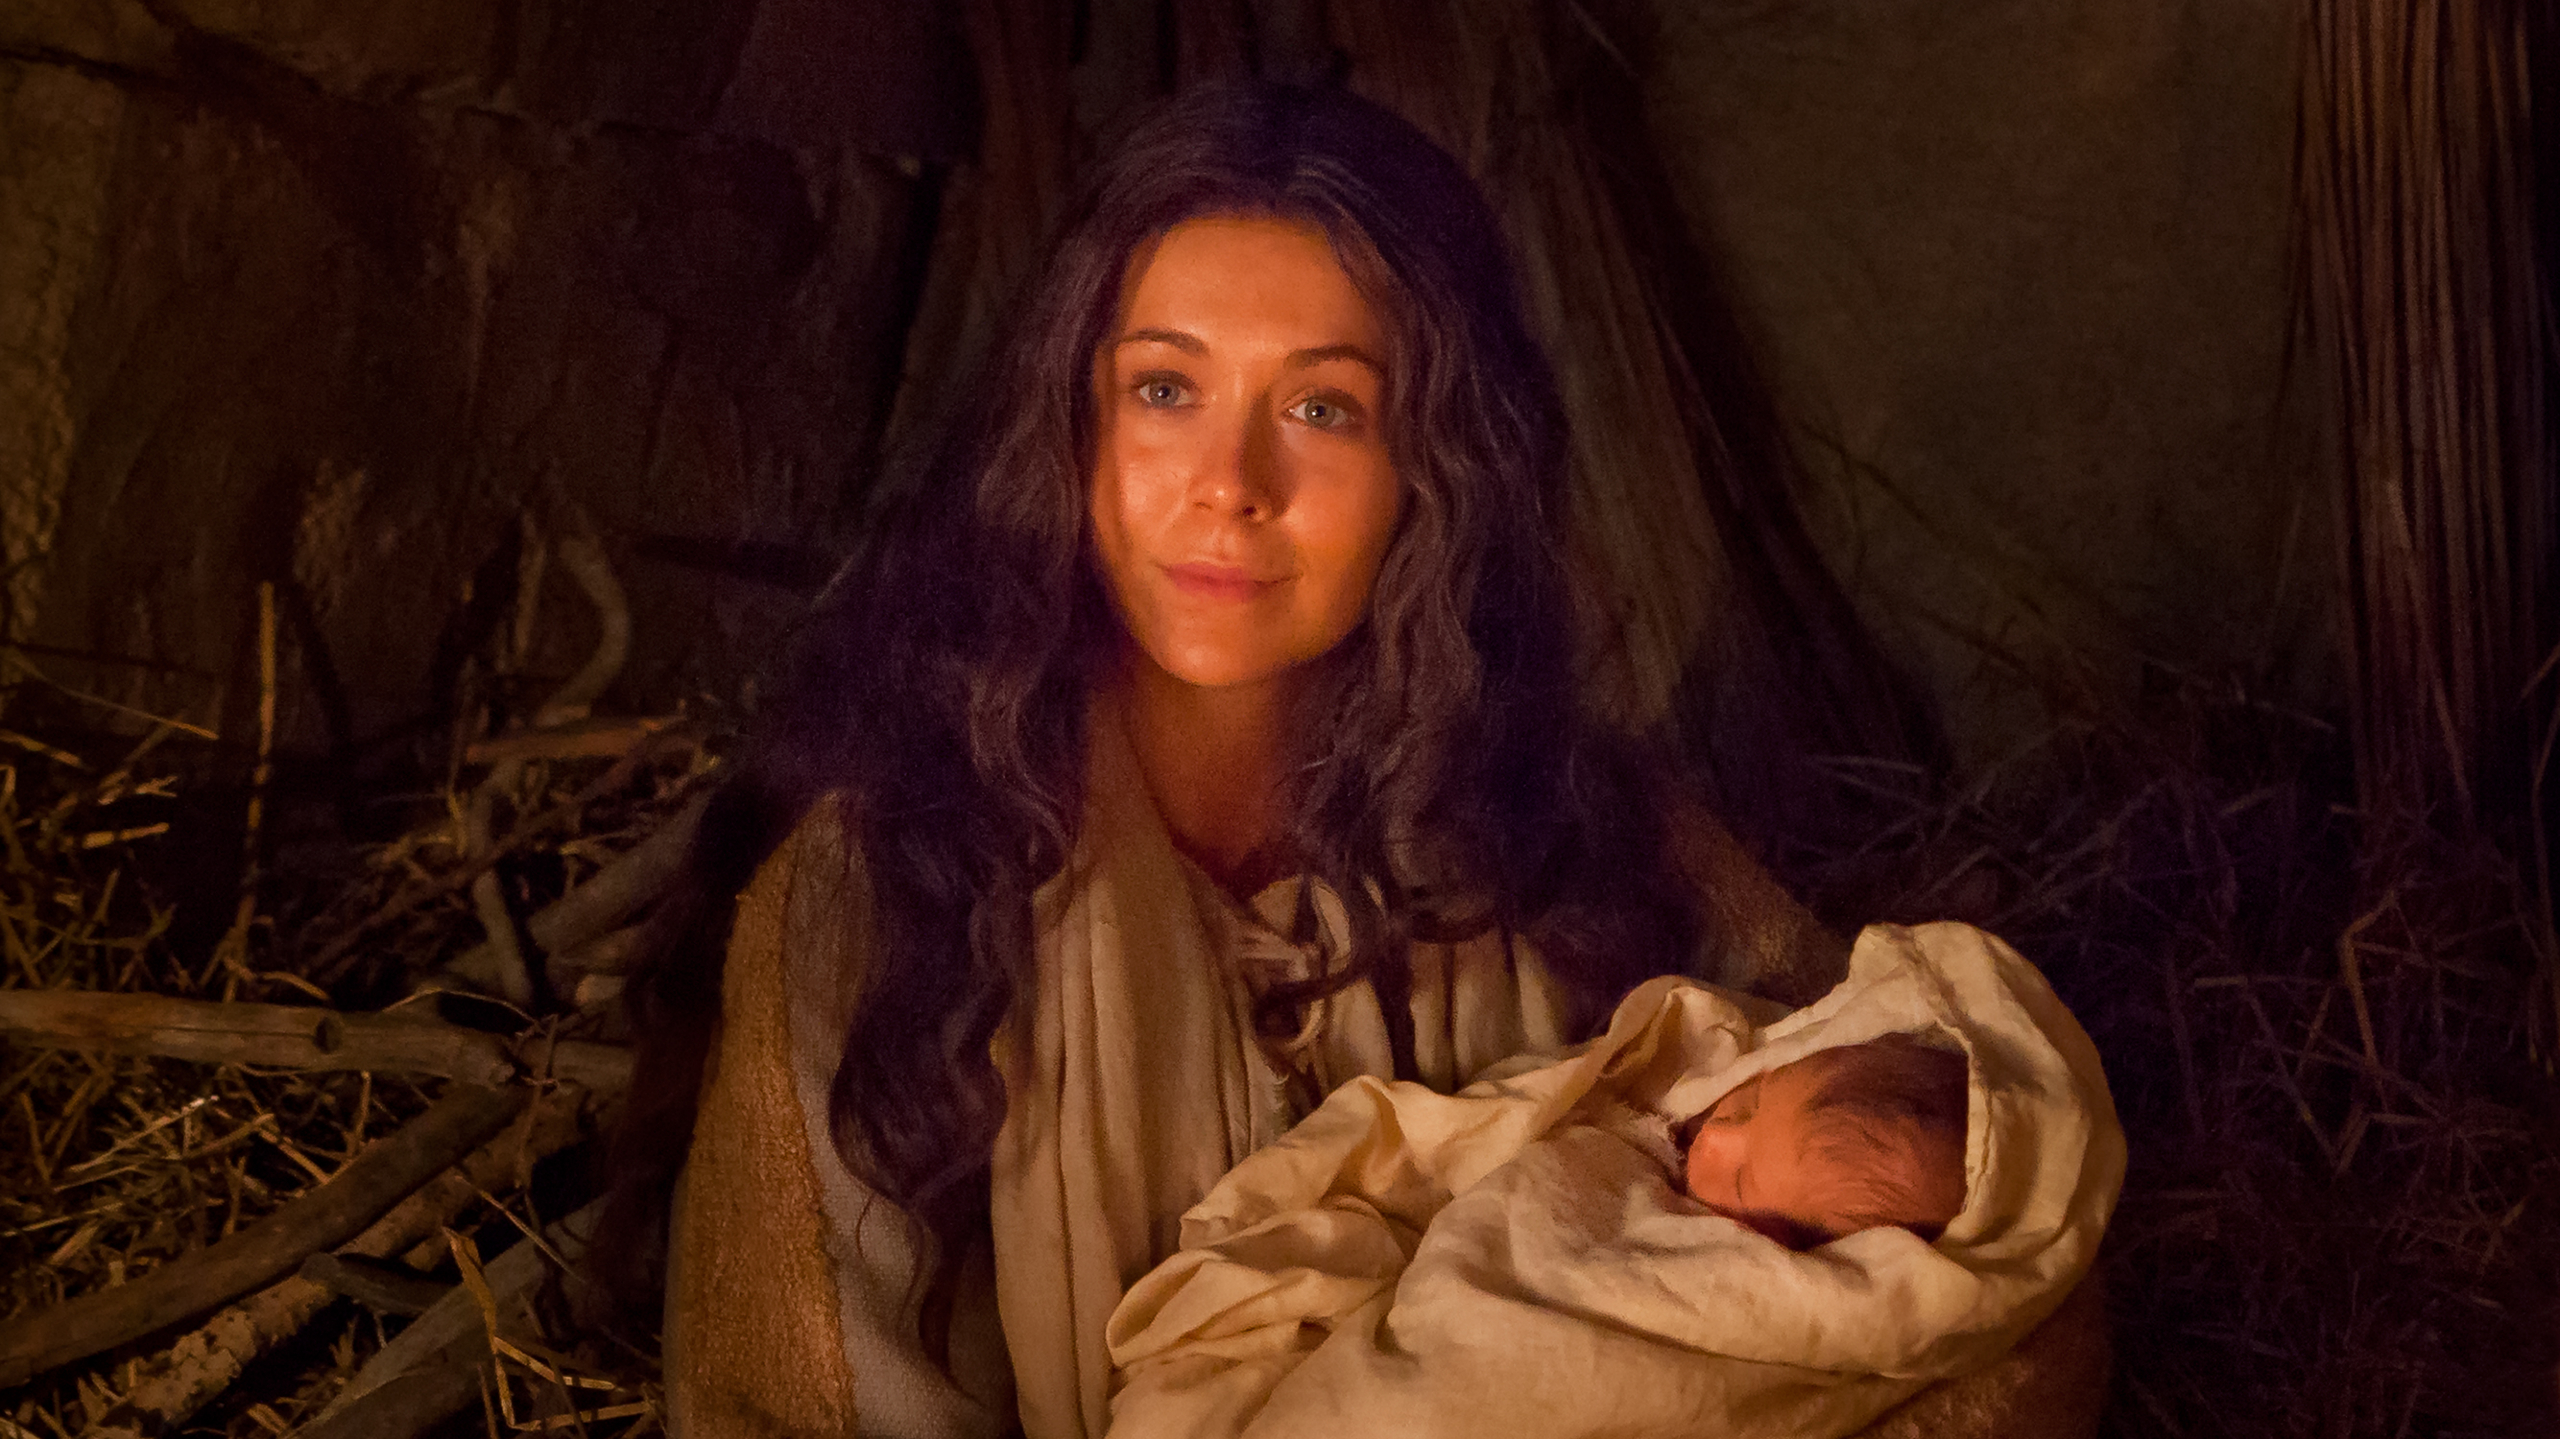 nativity jesus christ lds wallpaper - photo #36